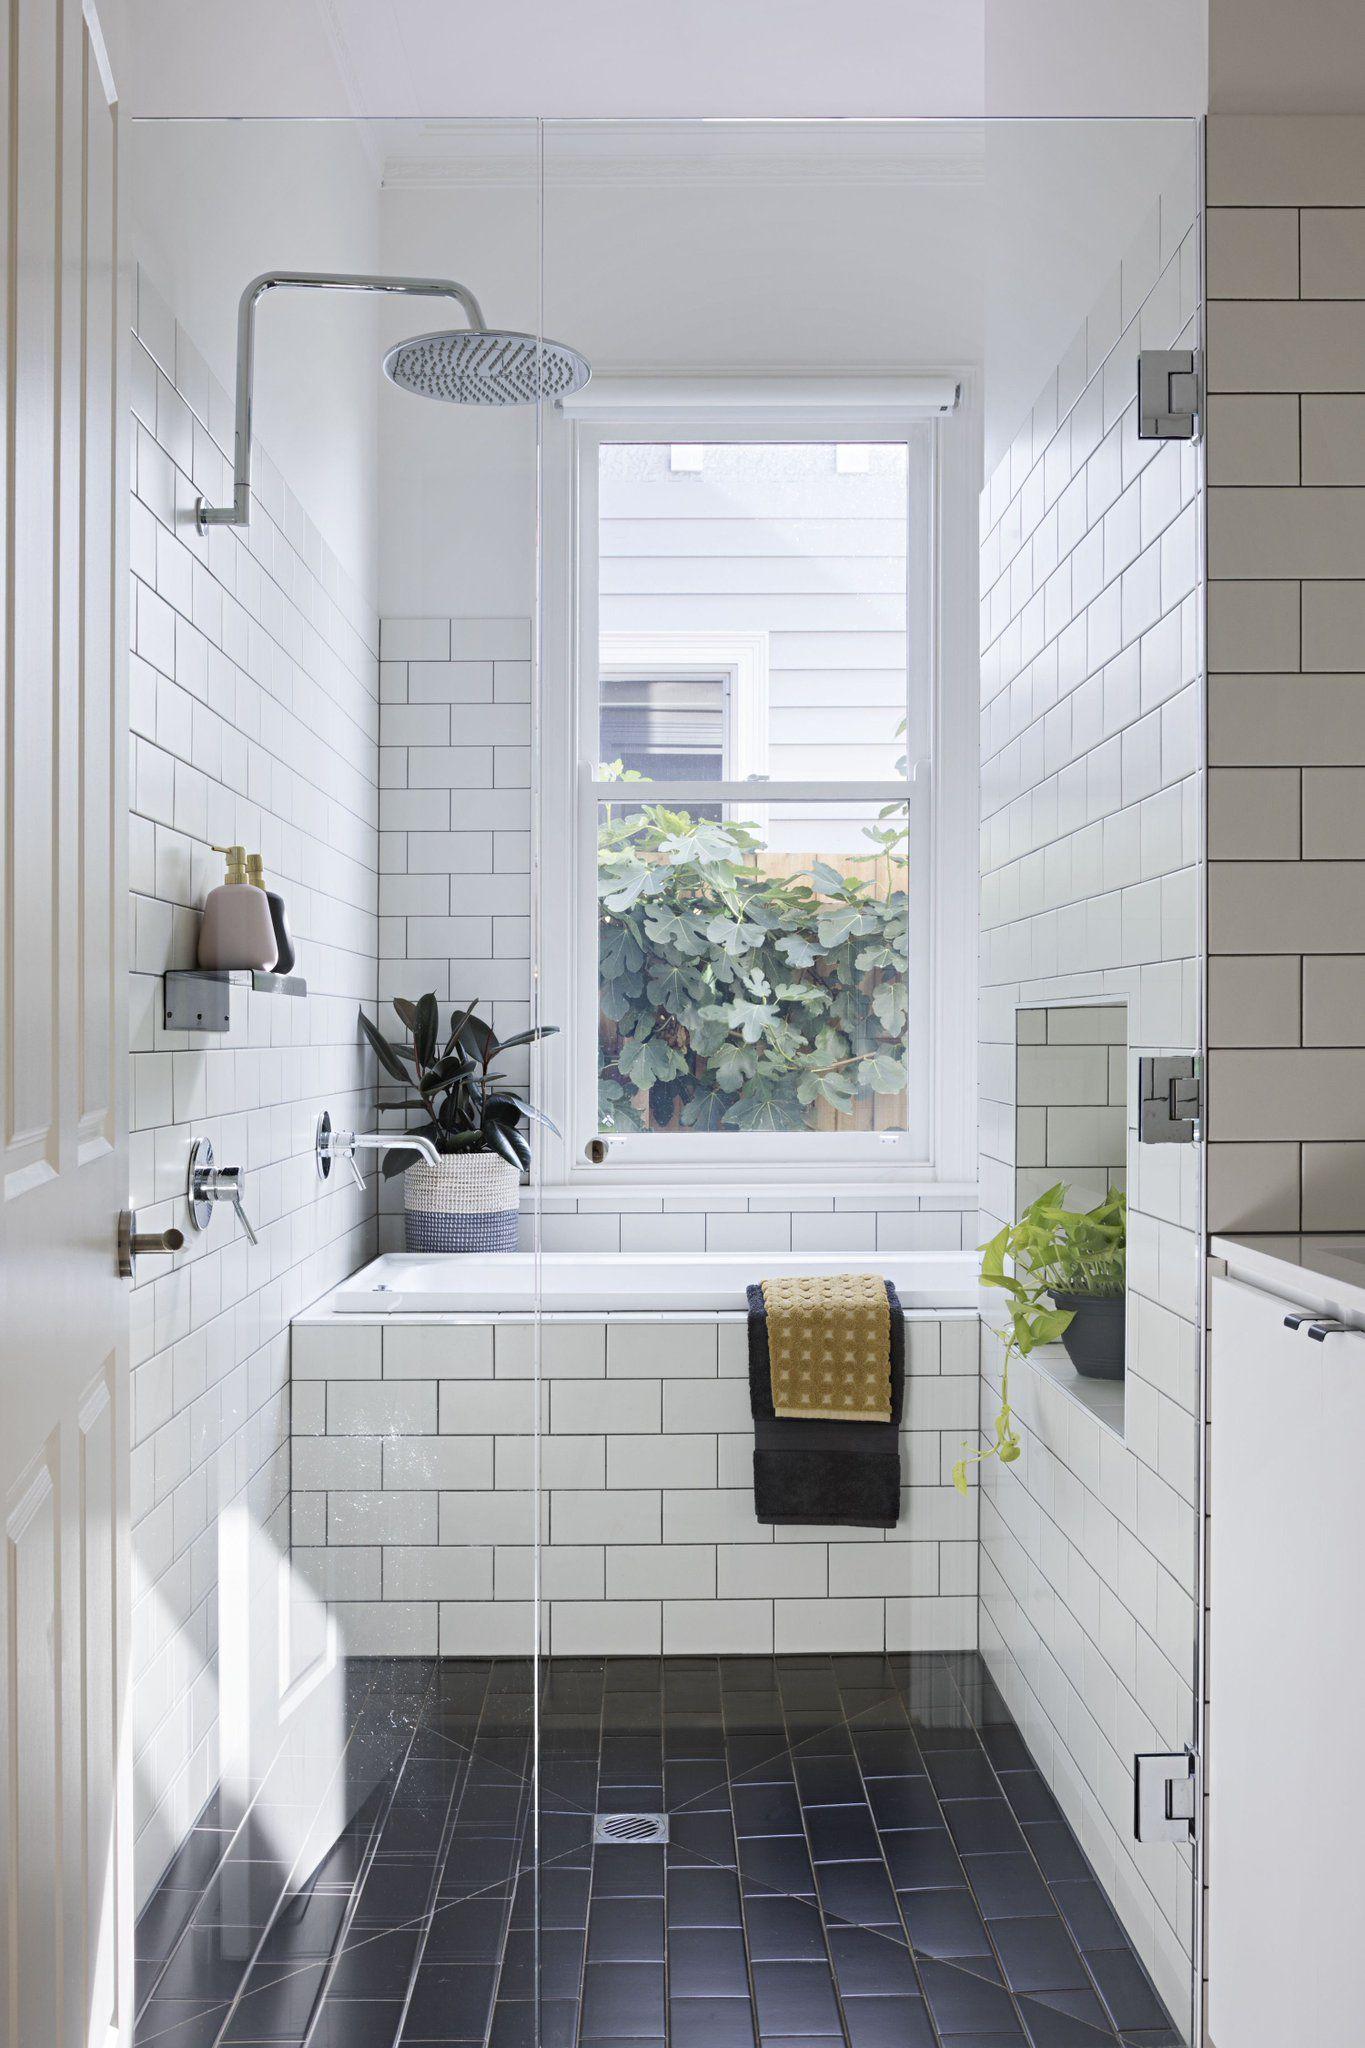 Spaces On With Images White Bathroom Tiles Parisian Apartment Decor Bathroom Design